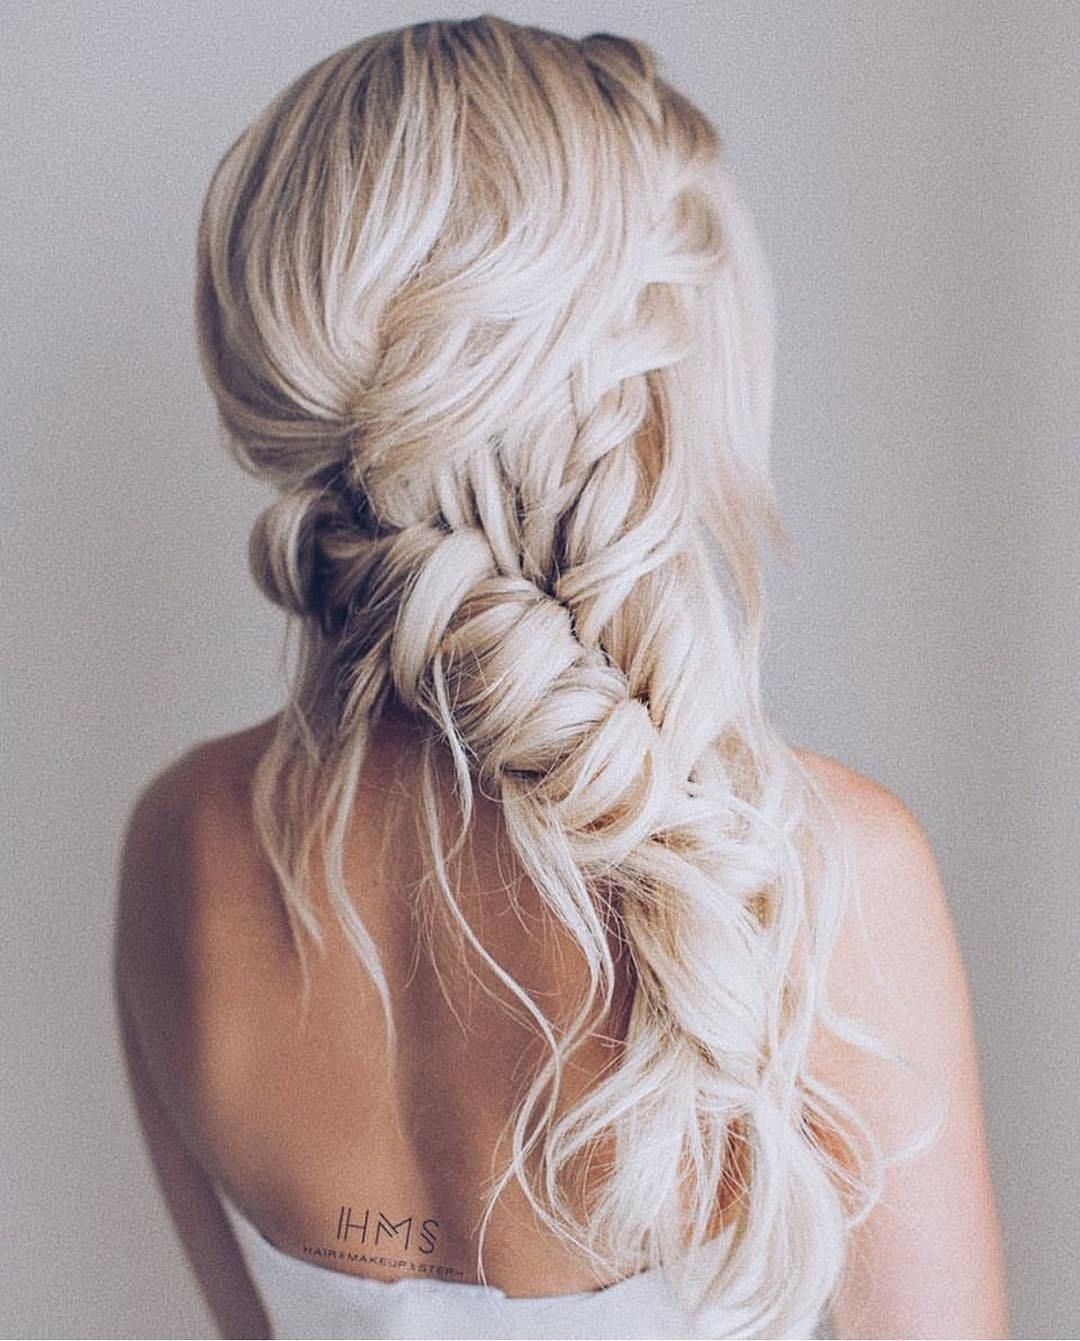 49 Boho Braid Hairstyles to Try - braid hairstyle #braids #hairstyles #bohohairstyles